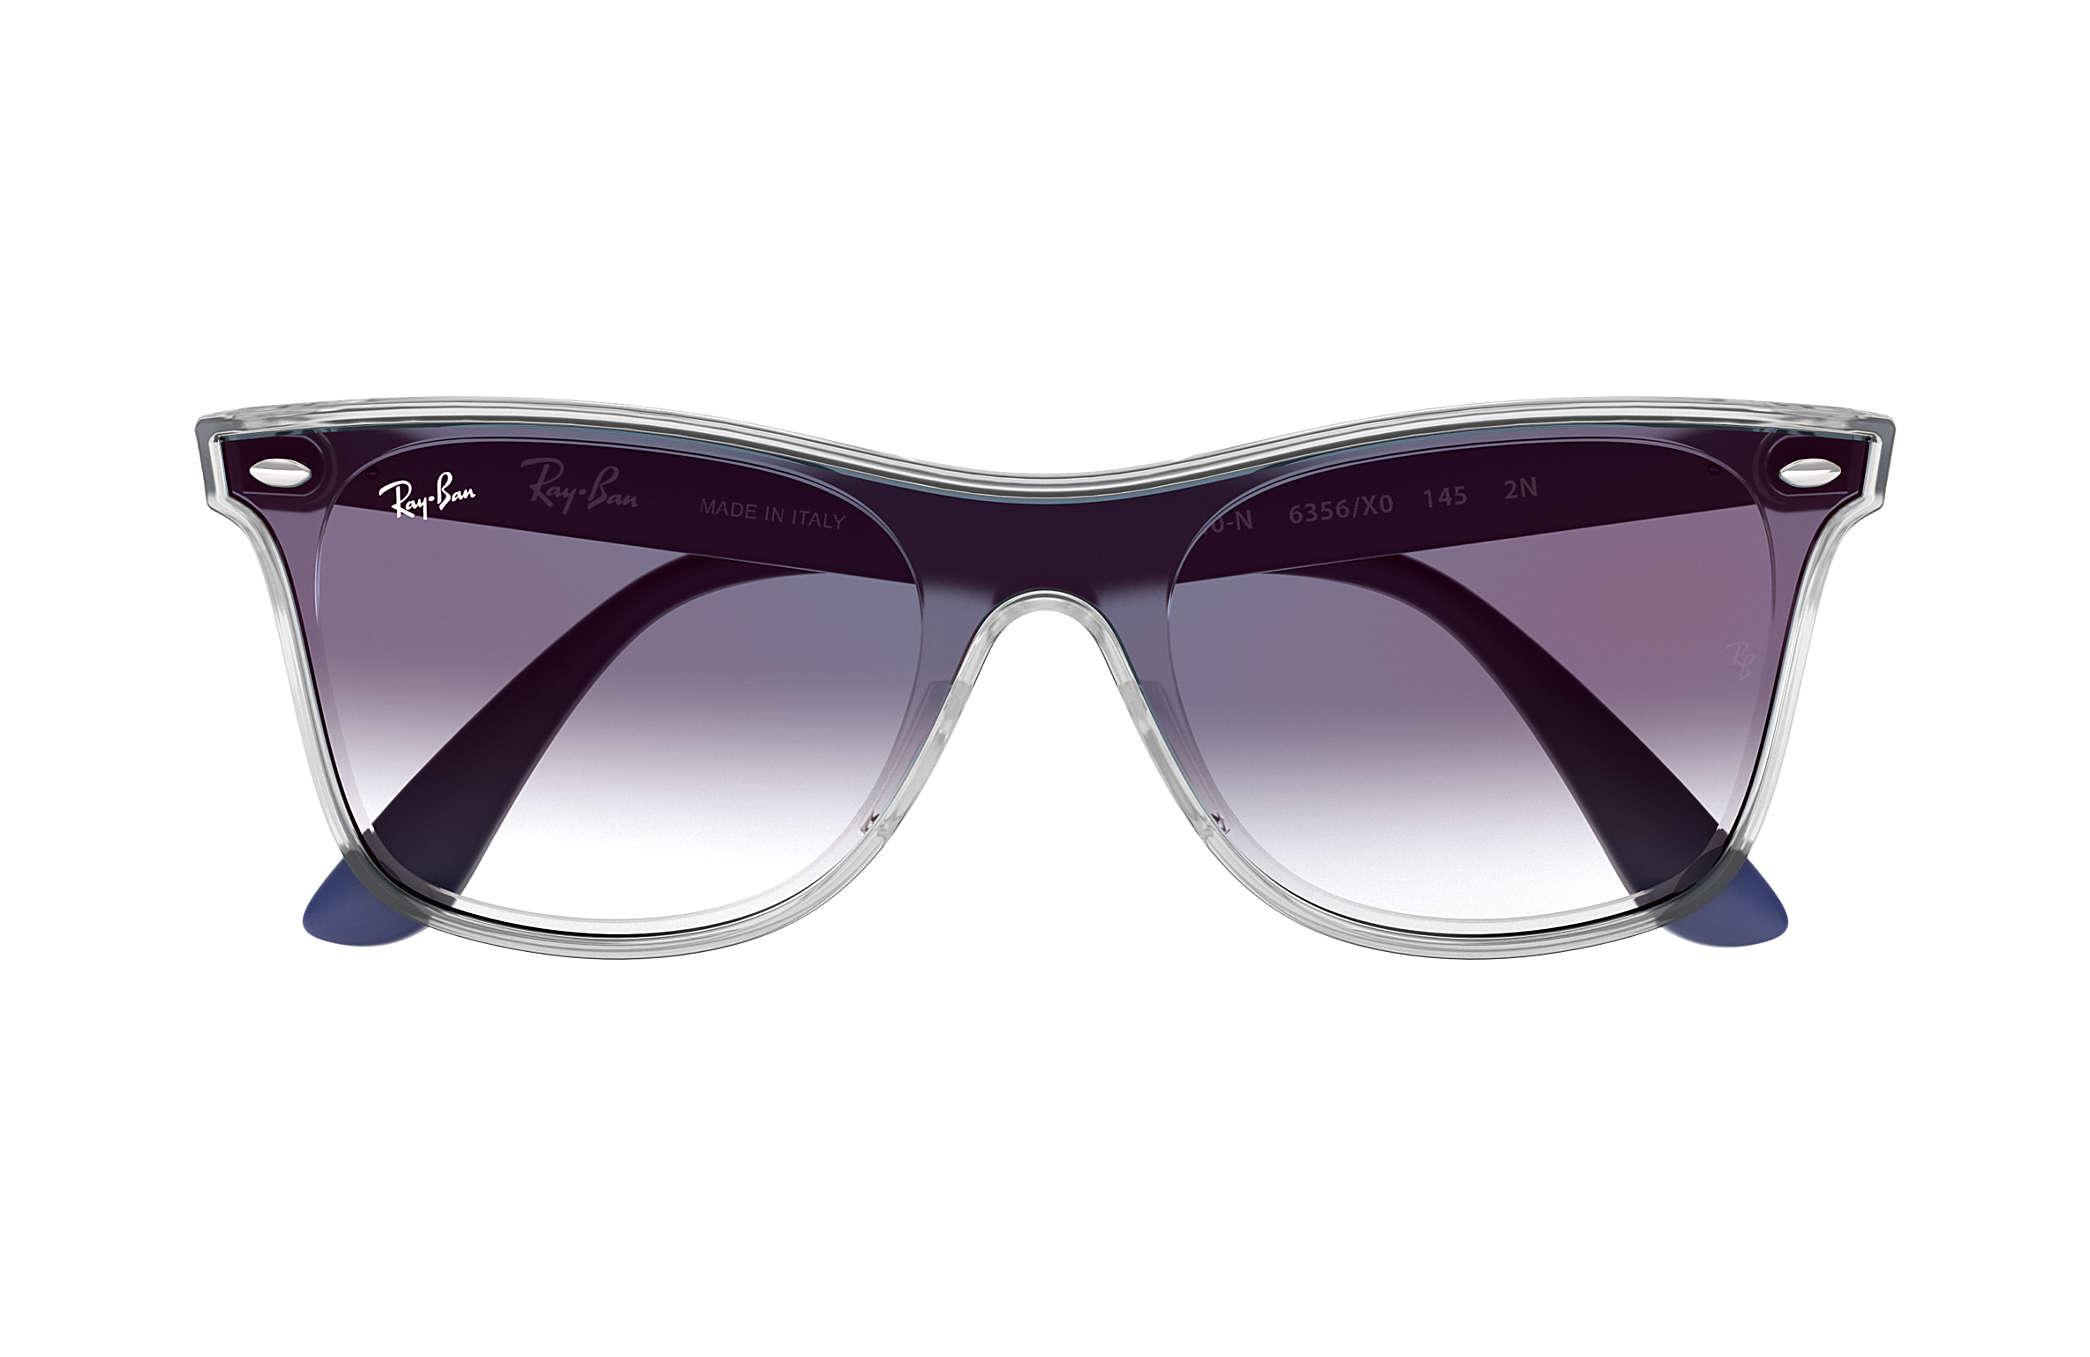 Ray-Ban Blaze Wayfarer RB4440N Transparent - Nylon - Gläser, Blau ...